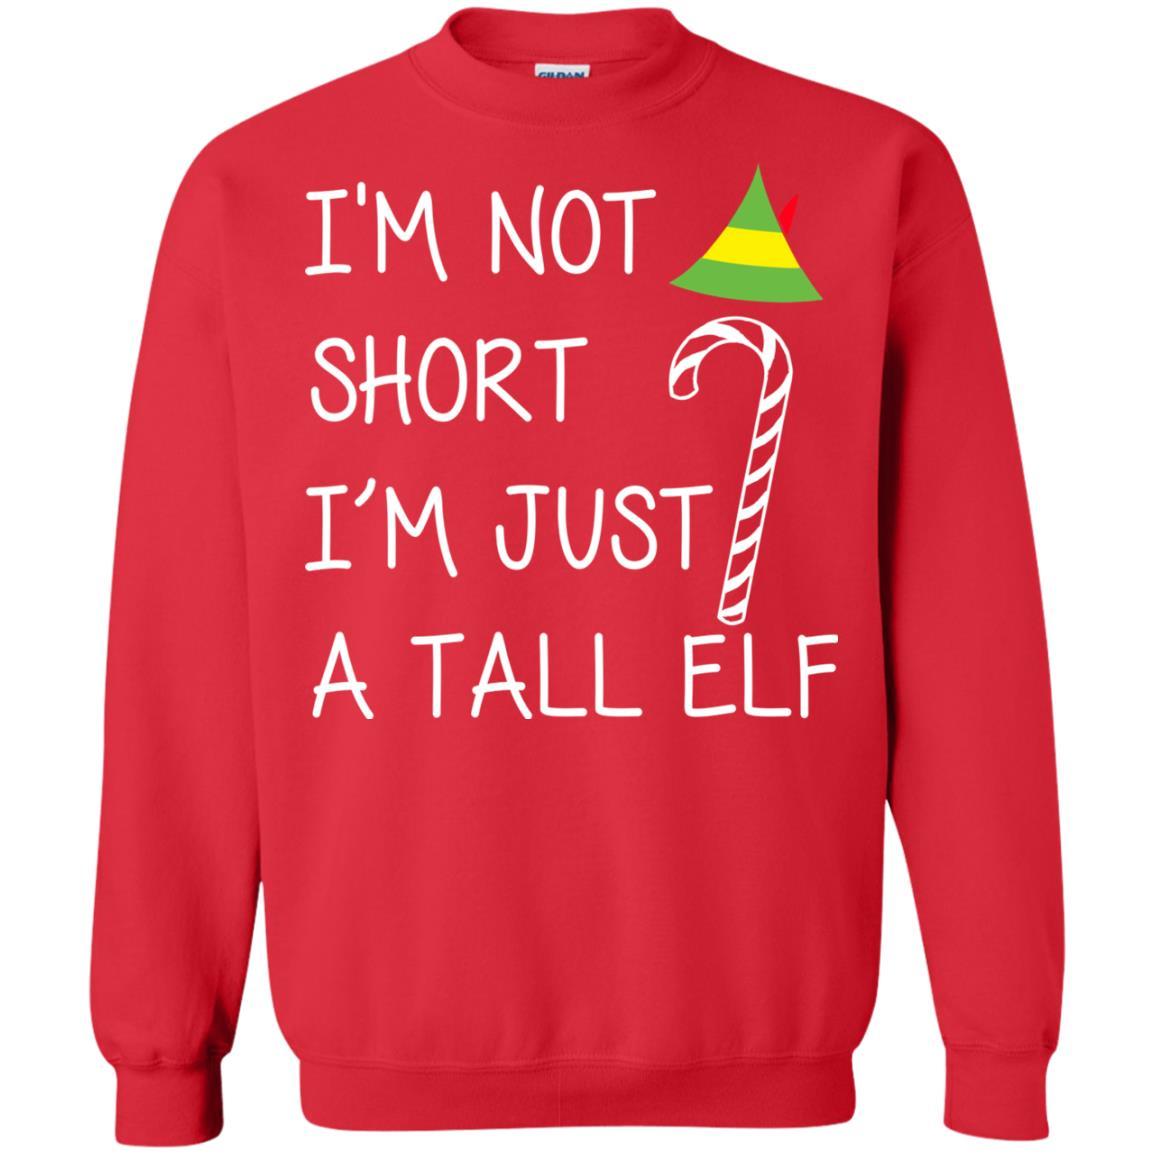 image 2706 - I'm Not Short I'm Just A Tall Elf Christmas Sweatshirt, Hoodie